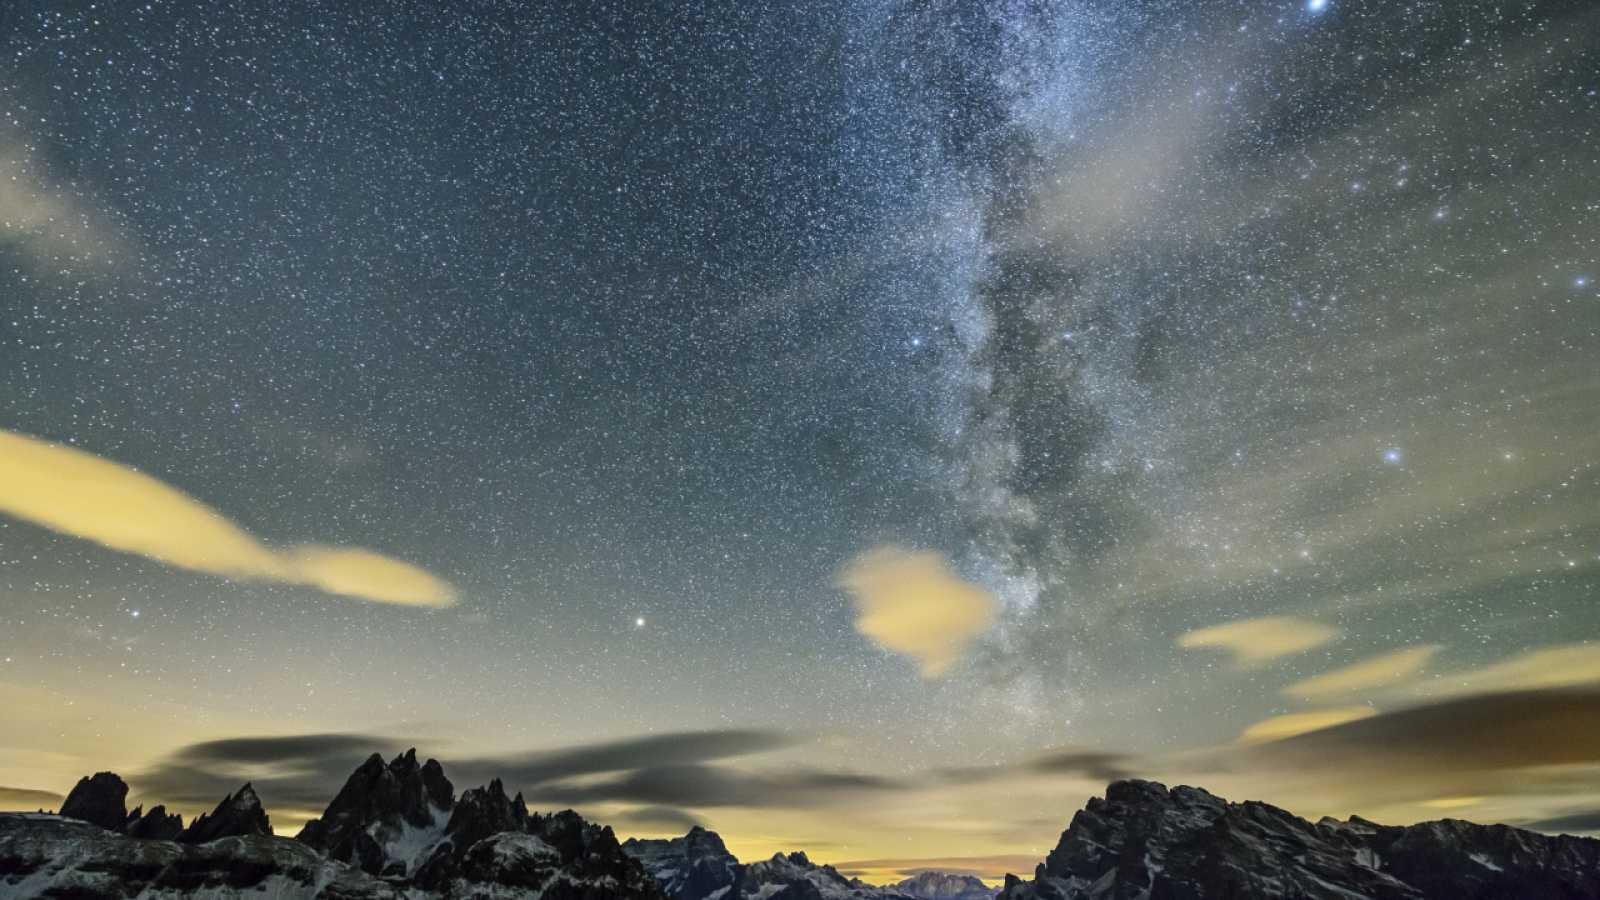 Aquí la Tierra - La Via Láctea